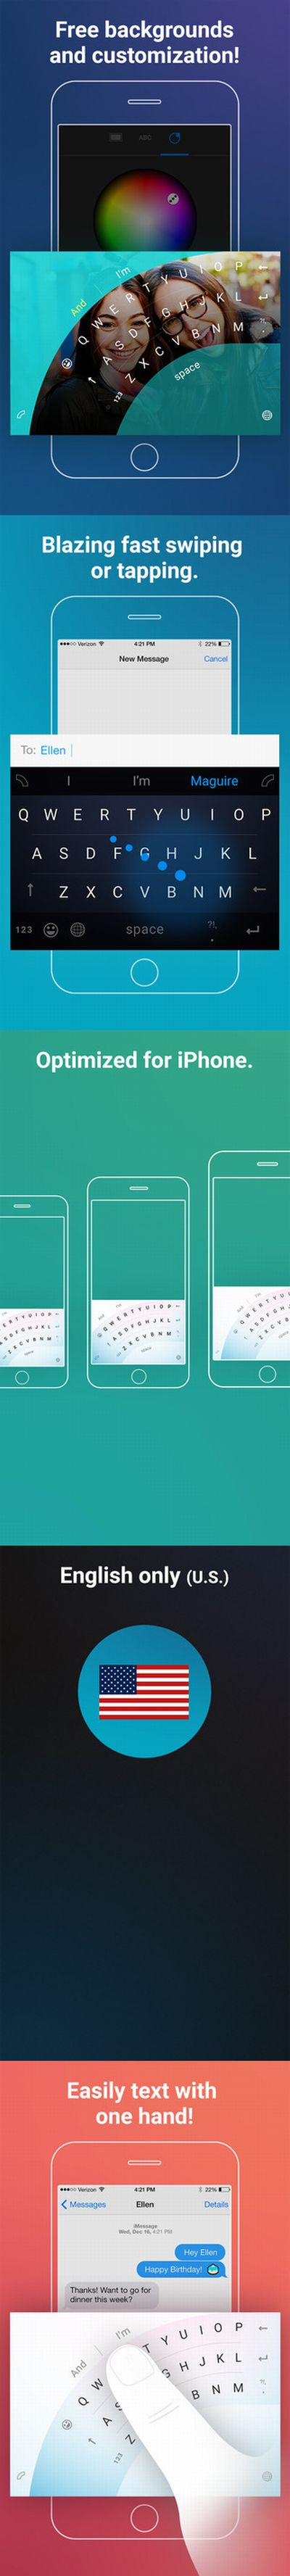 Microsoft Word Flow billentyűzet iPhone-ra